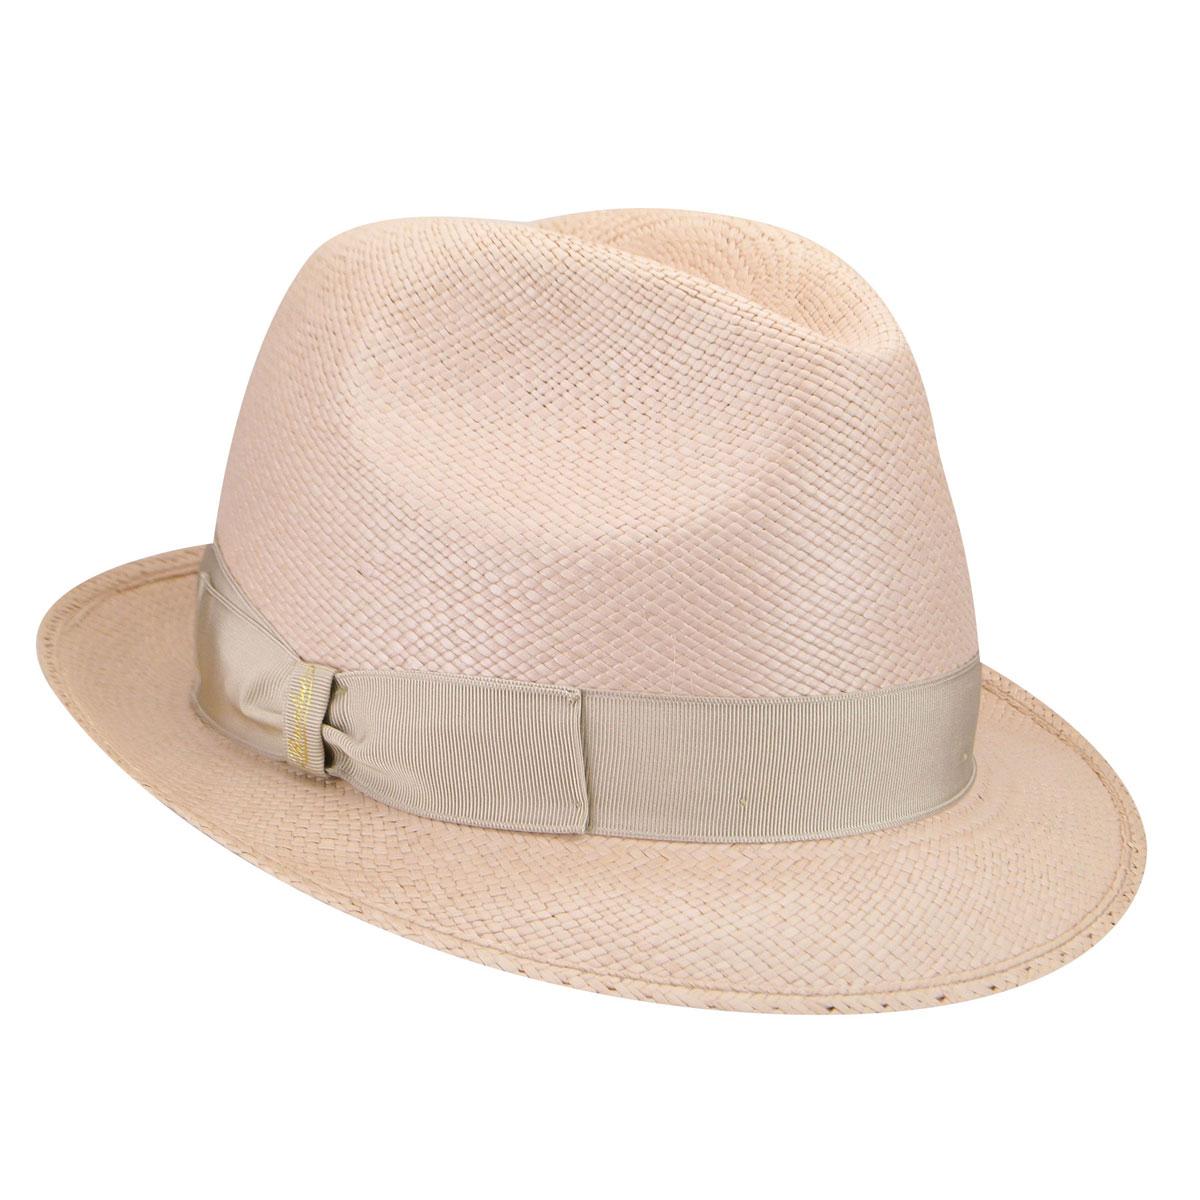 1940s Hats History 232099 Quito Tesa Piccola Fedora $263.00 AT vintagedancer.com